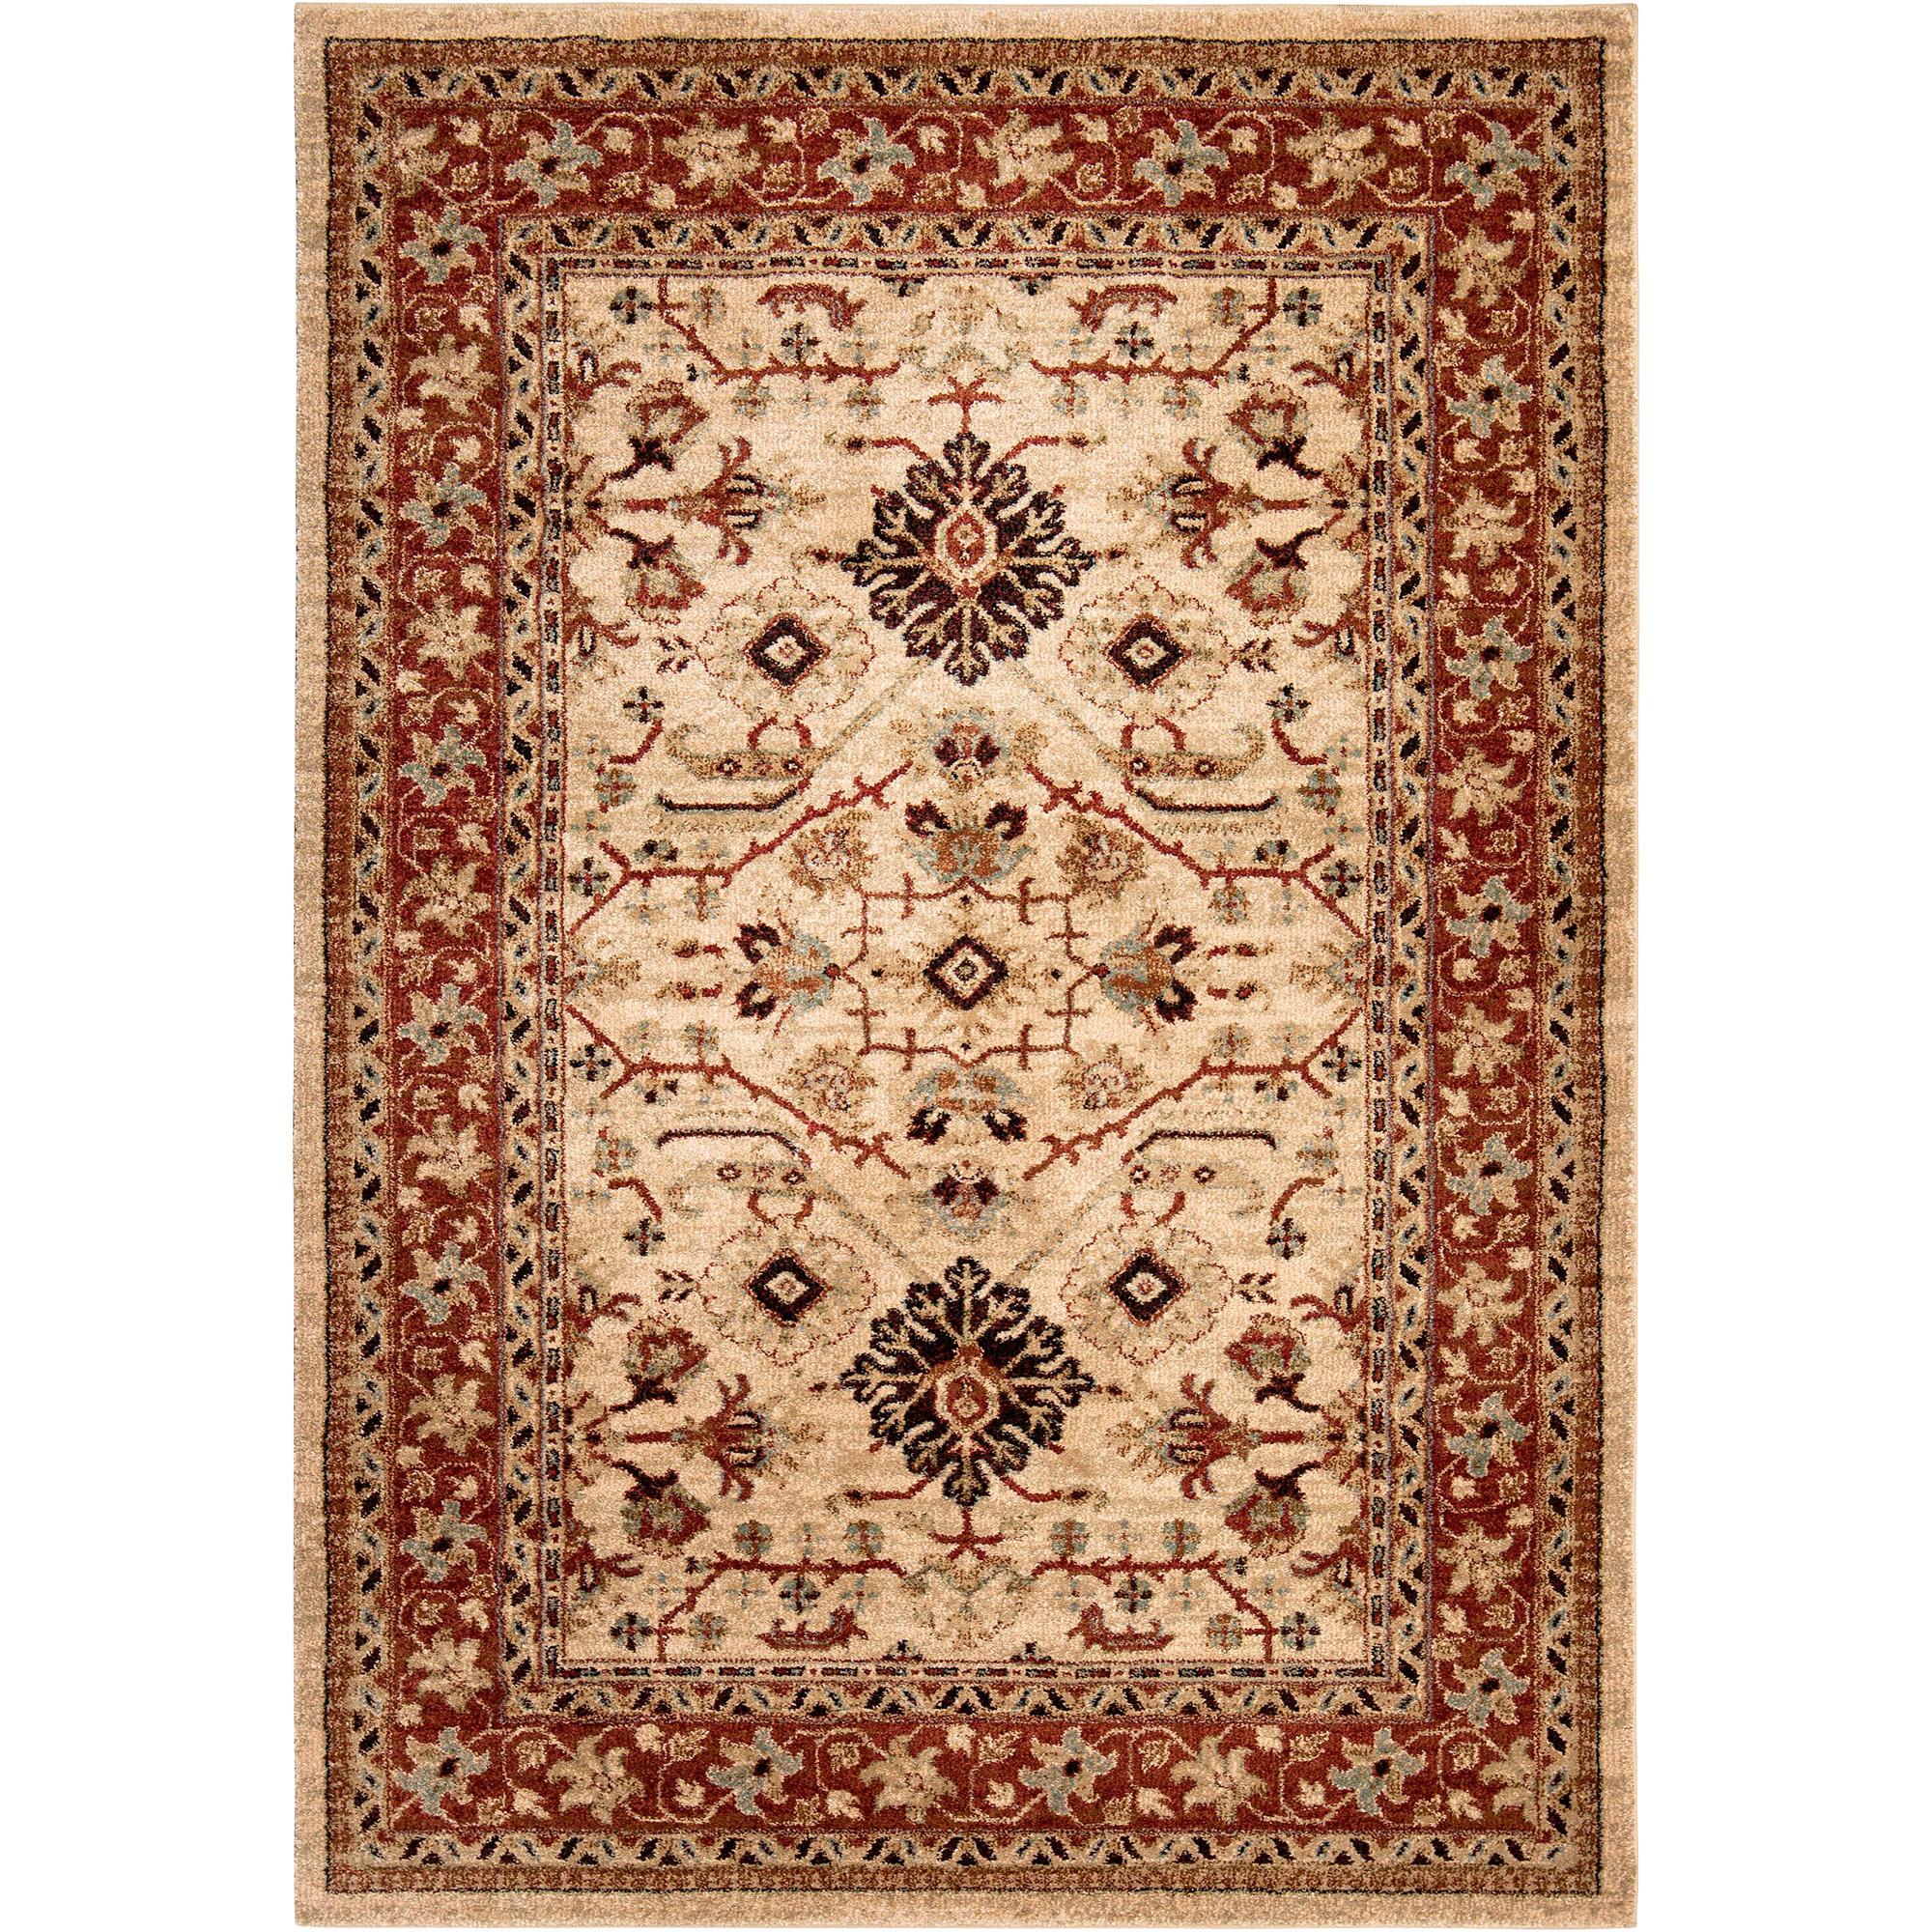 Orian | Aria Kashmir Bisque 8x10 Area Rug